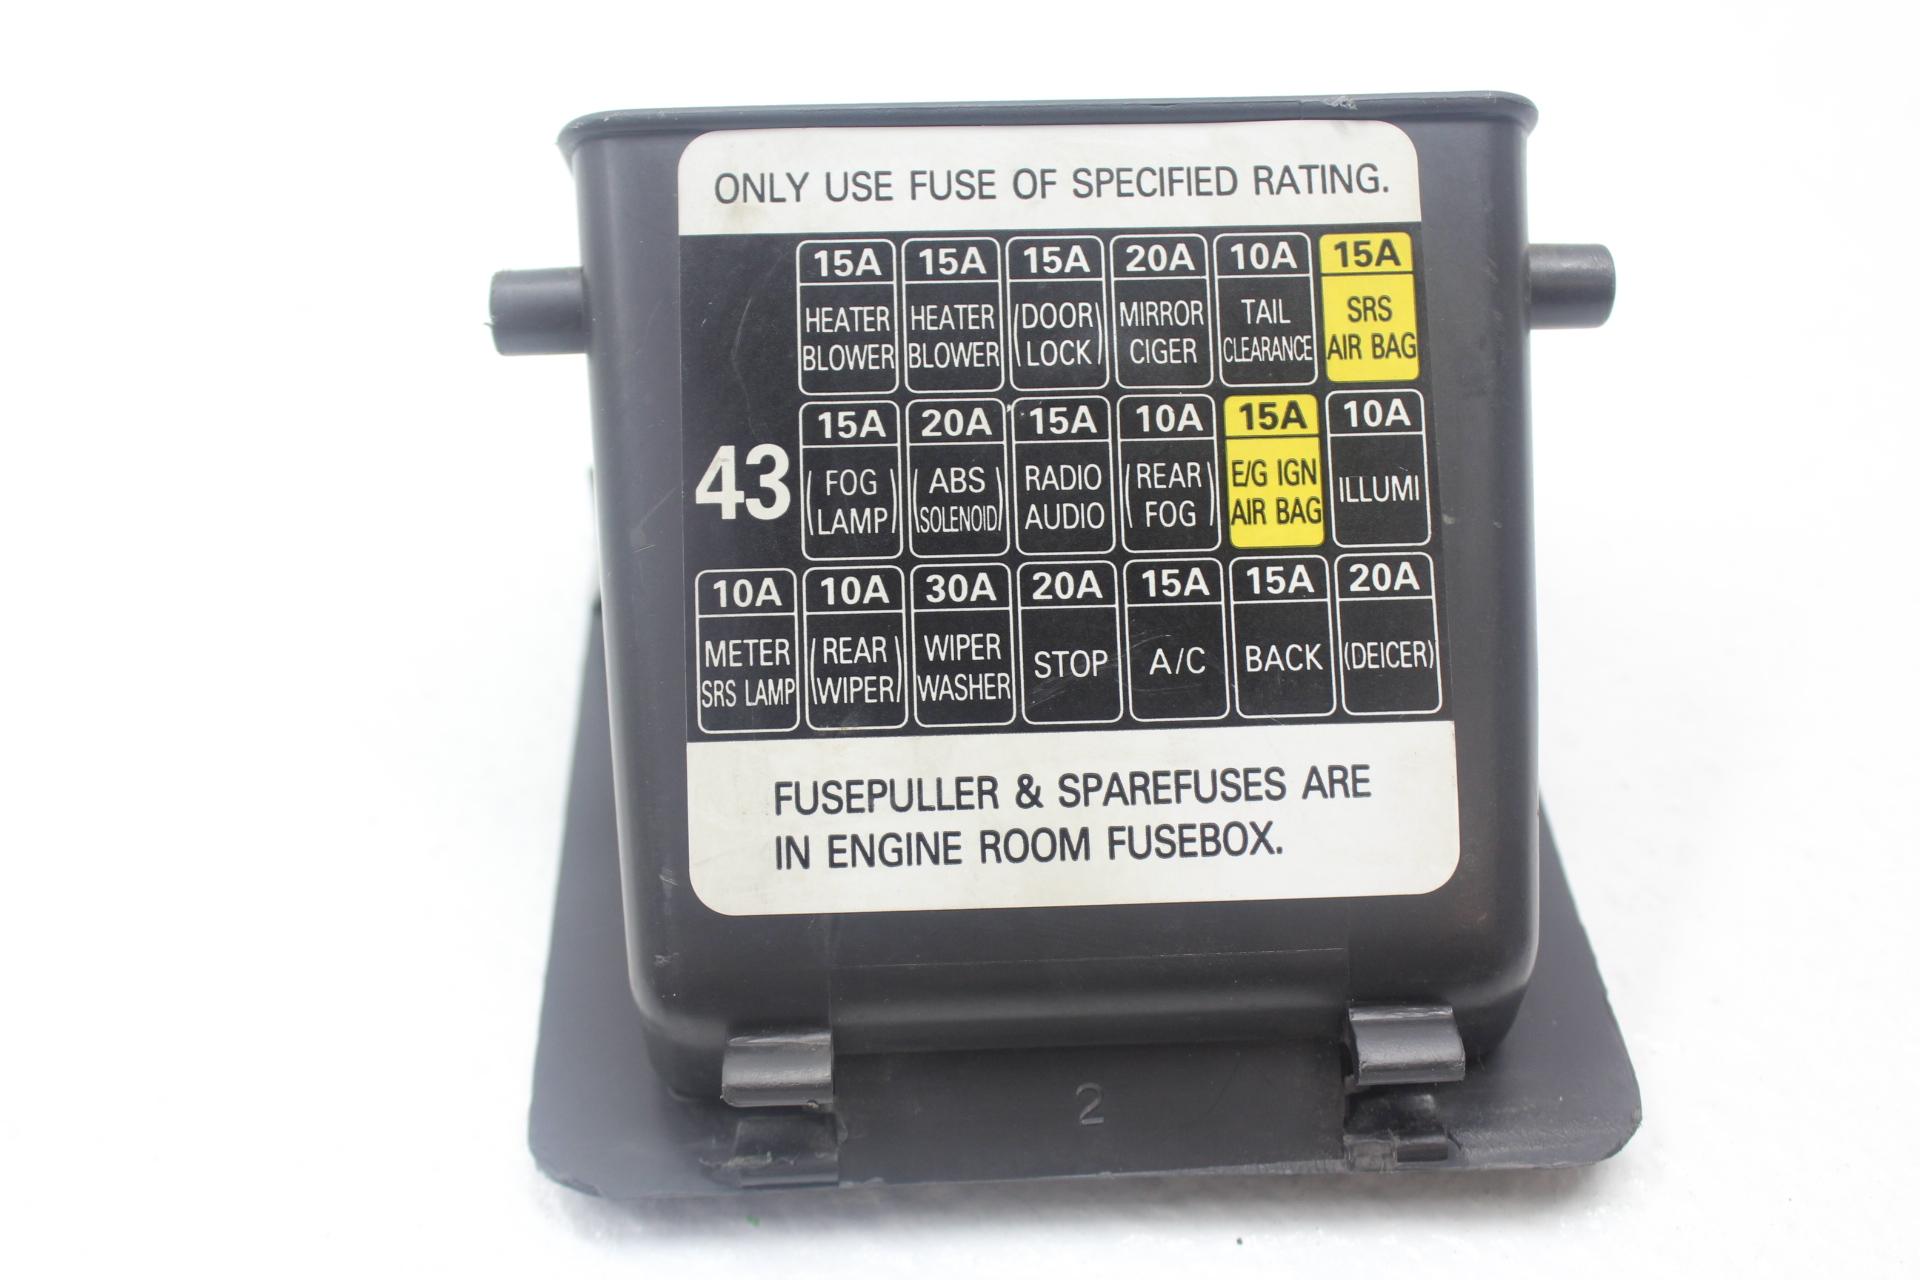 Subaru Impreza 2002 Fuse Box Reinvent Your Wiring Diagram 2005 Wrx Sti Under Dash Interior Rh Subieautoparts Com